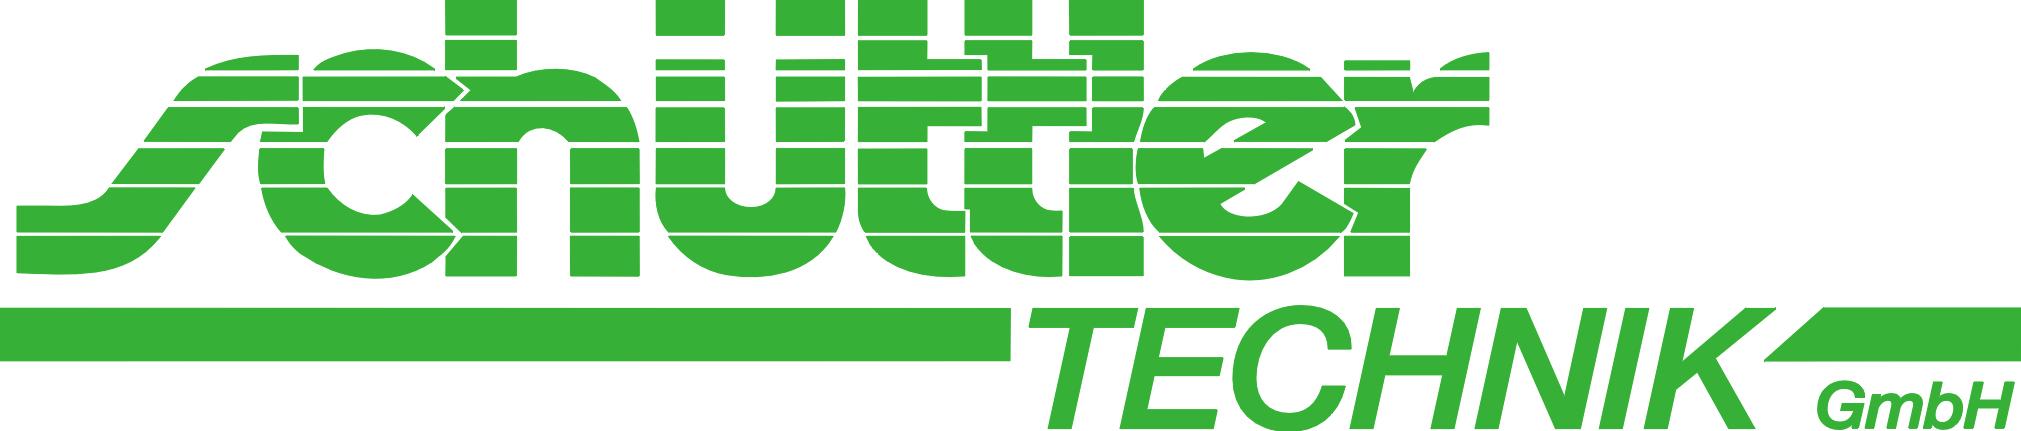 Schüttler Technik GmbH